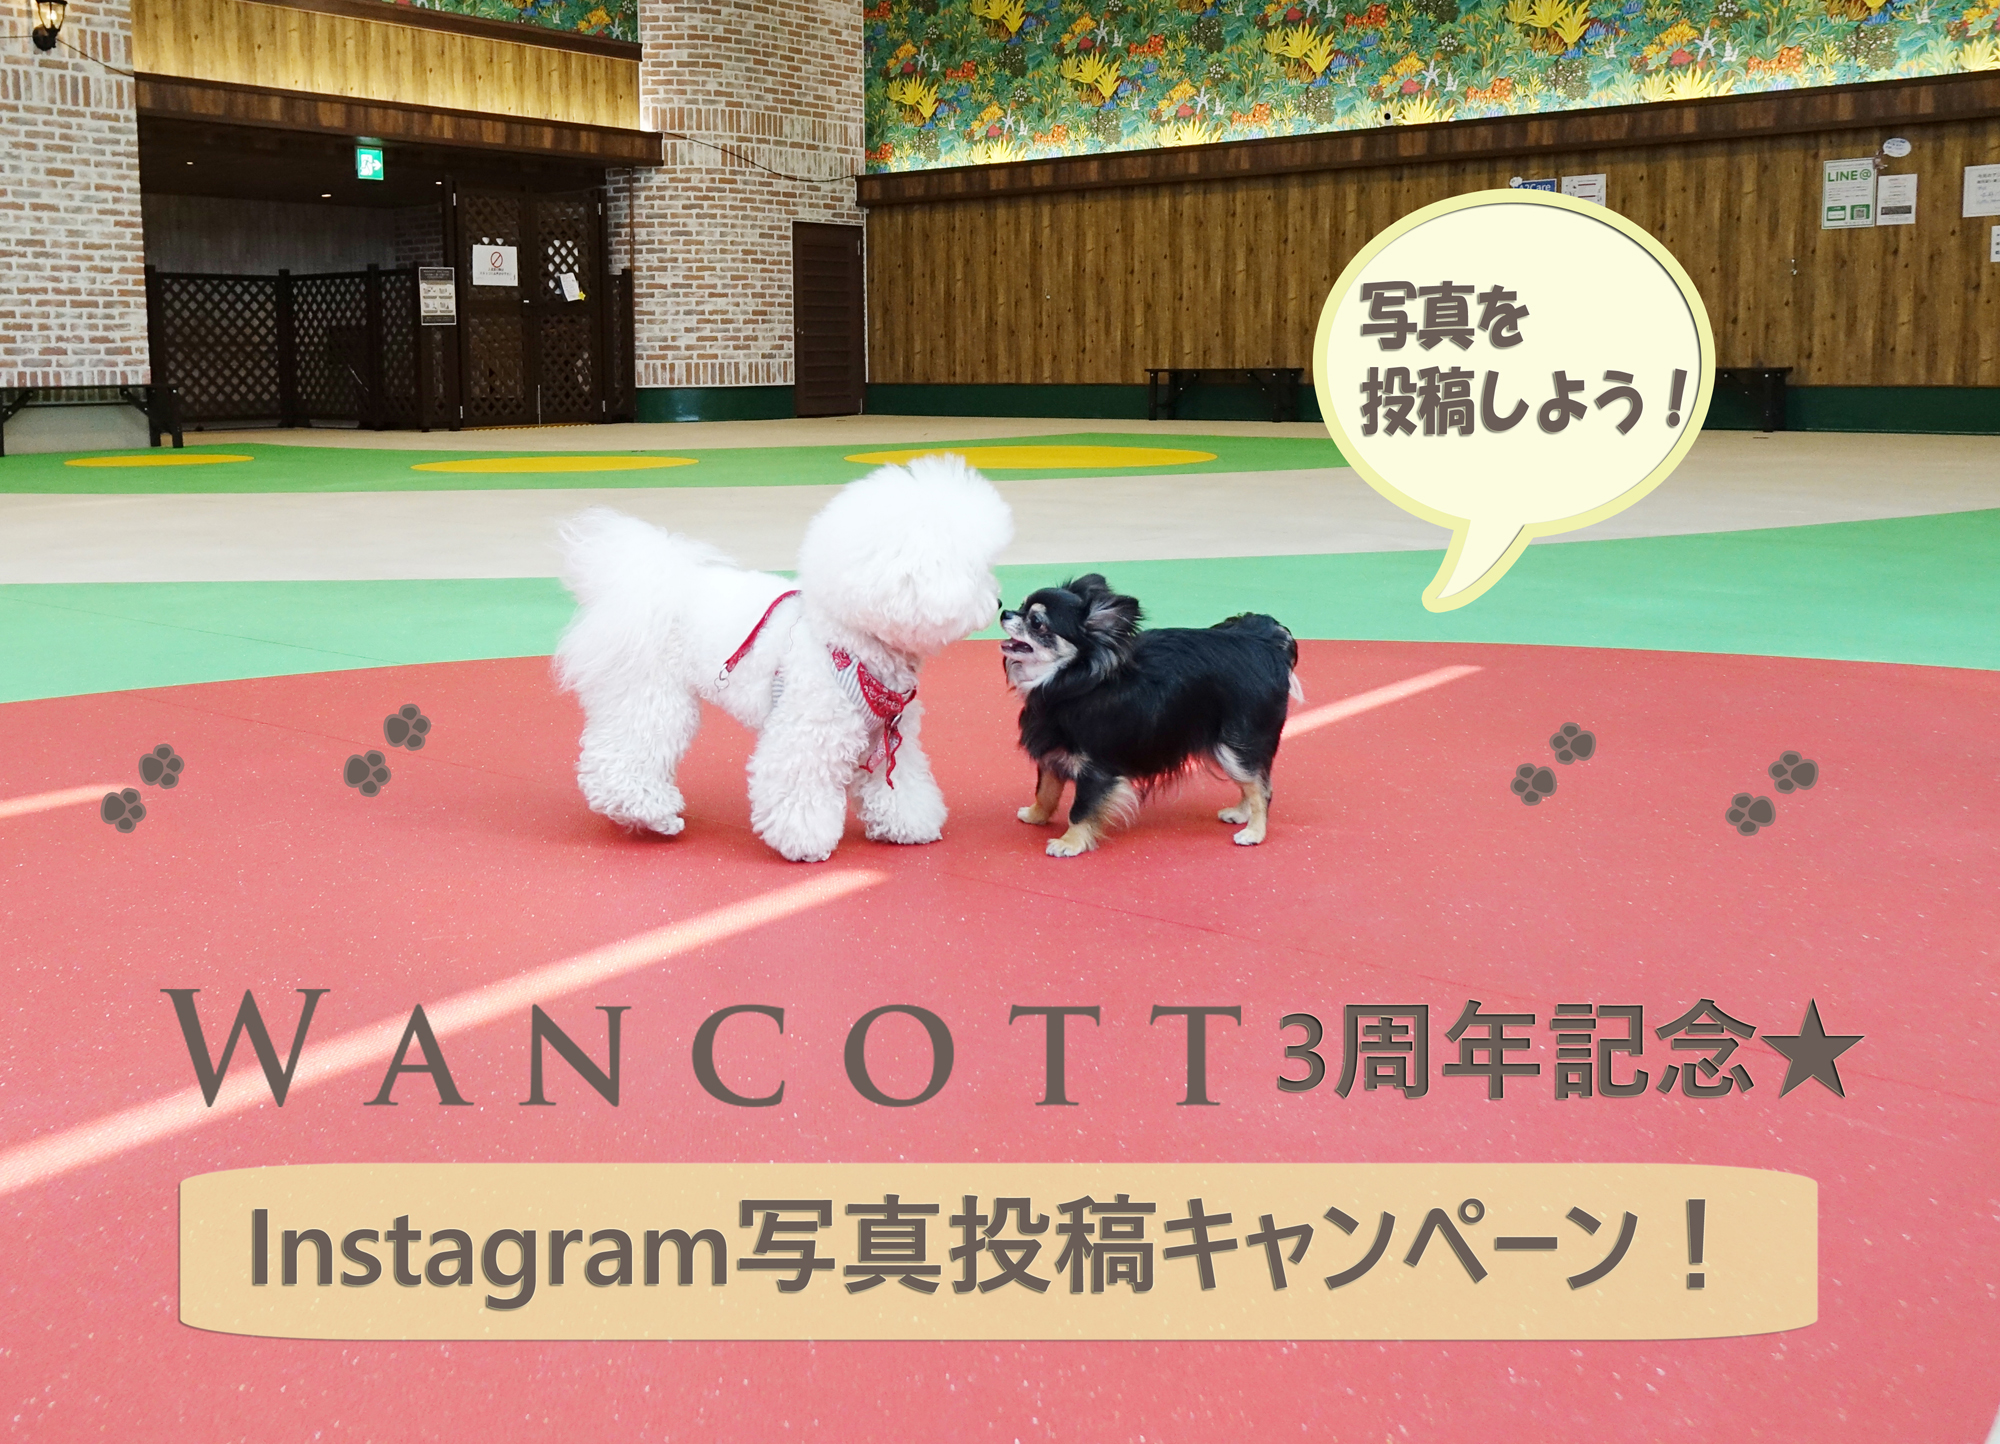 WANCOTT3周年!instagram写真投稿キャンペーン開催!